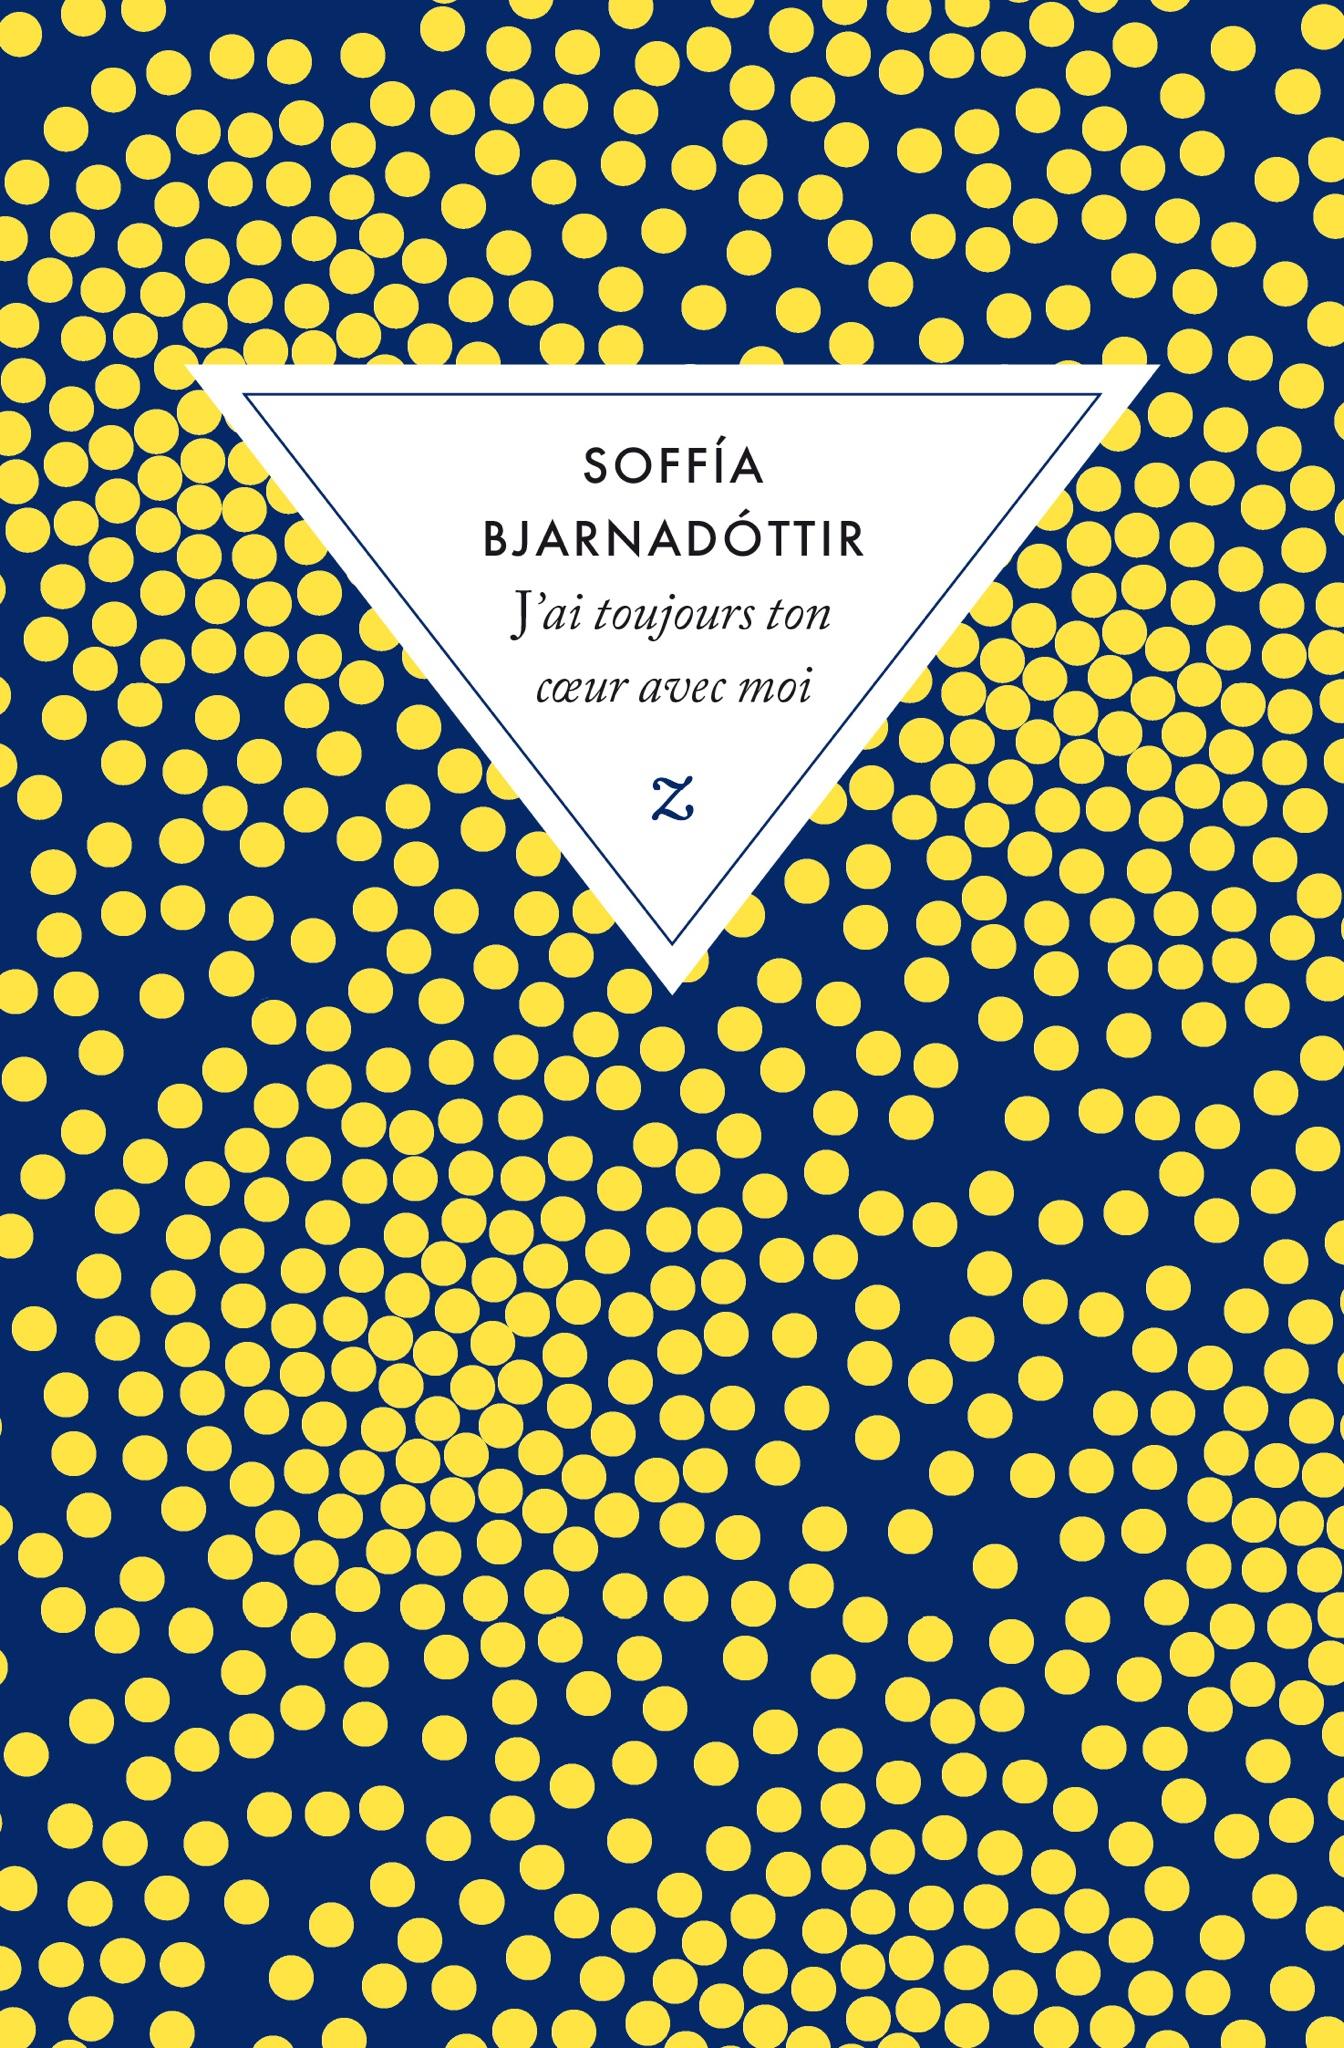 Soffia Bjarnadottir : J'ai toujours ton cœur avec moi